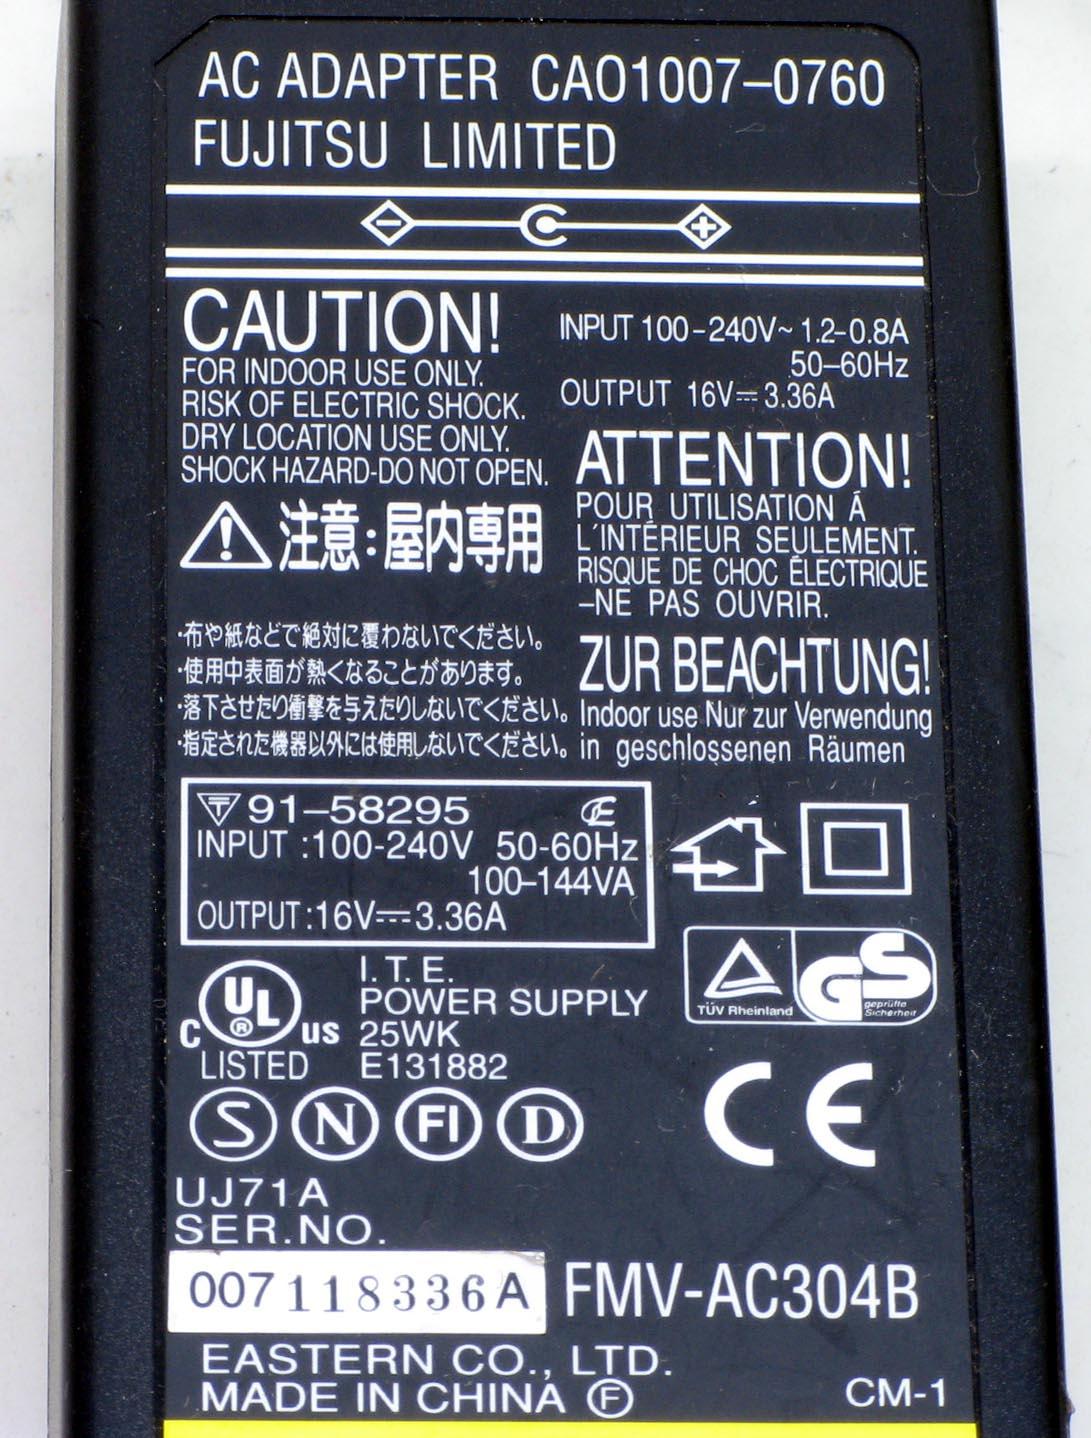 N-3/富士通 ノートPC用ACアダプタ FMV-AC304B 16V/3.36A 電源コード付